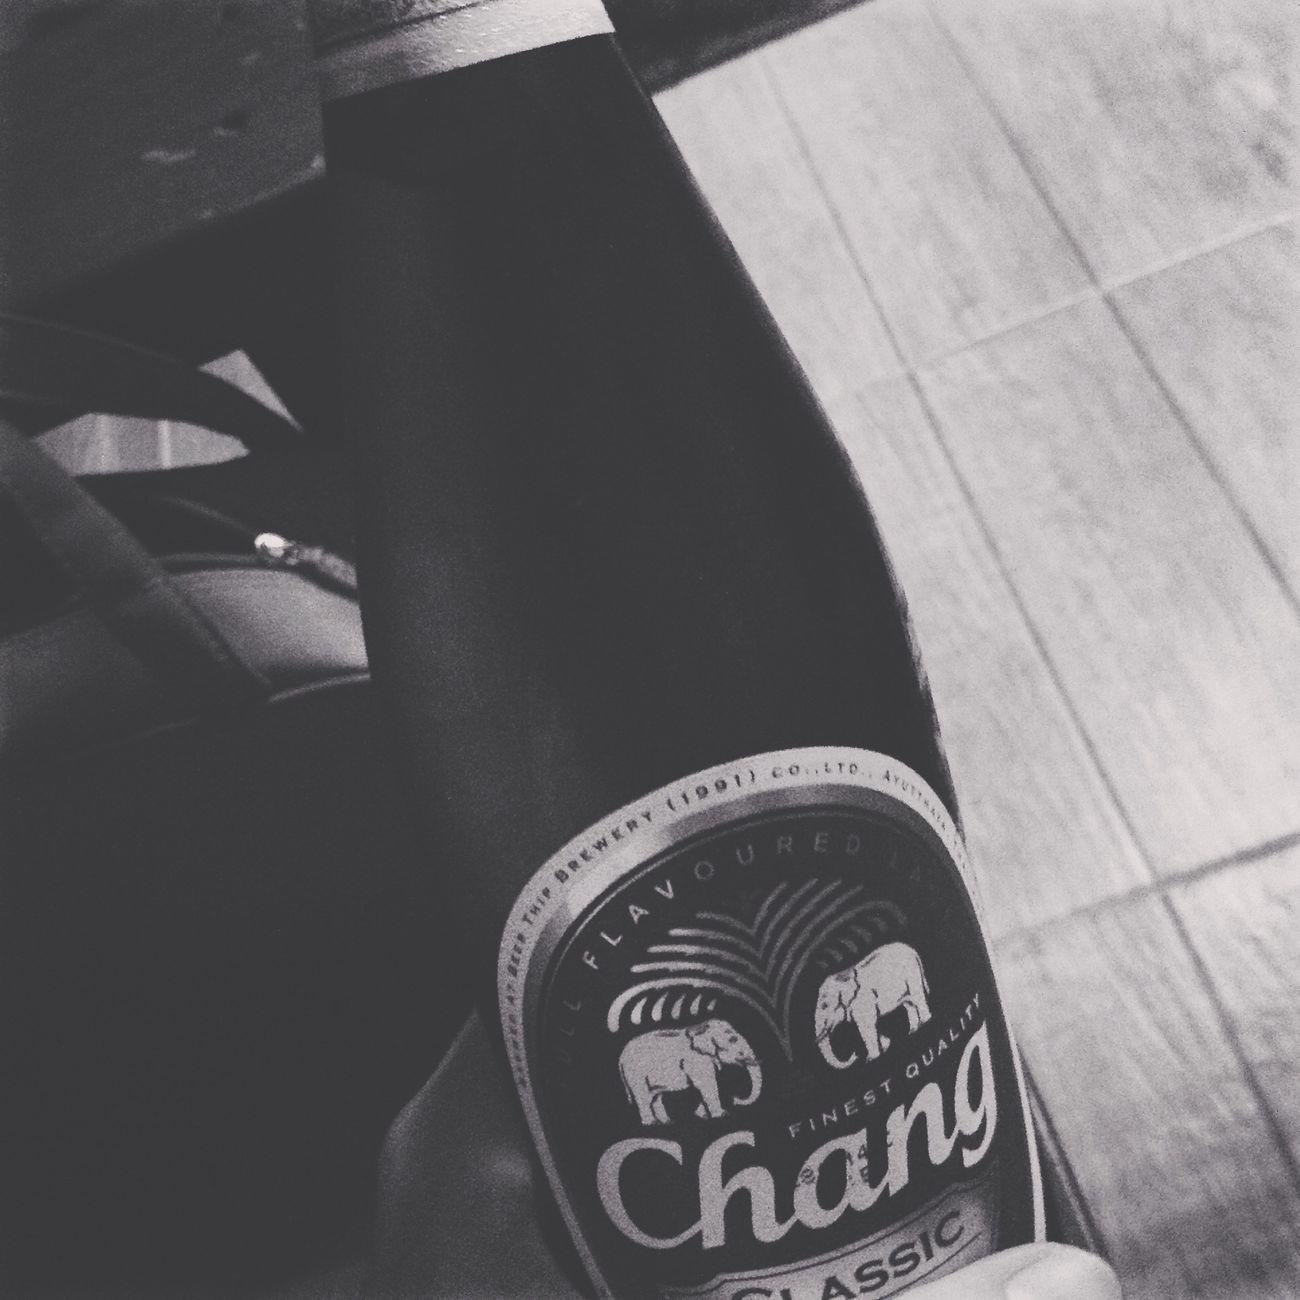 Last Drink, I Promise